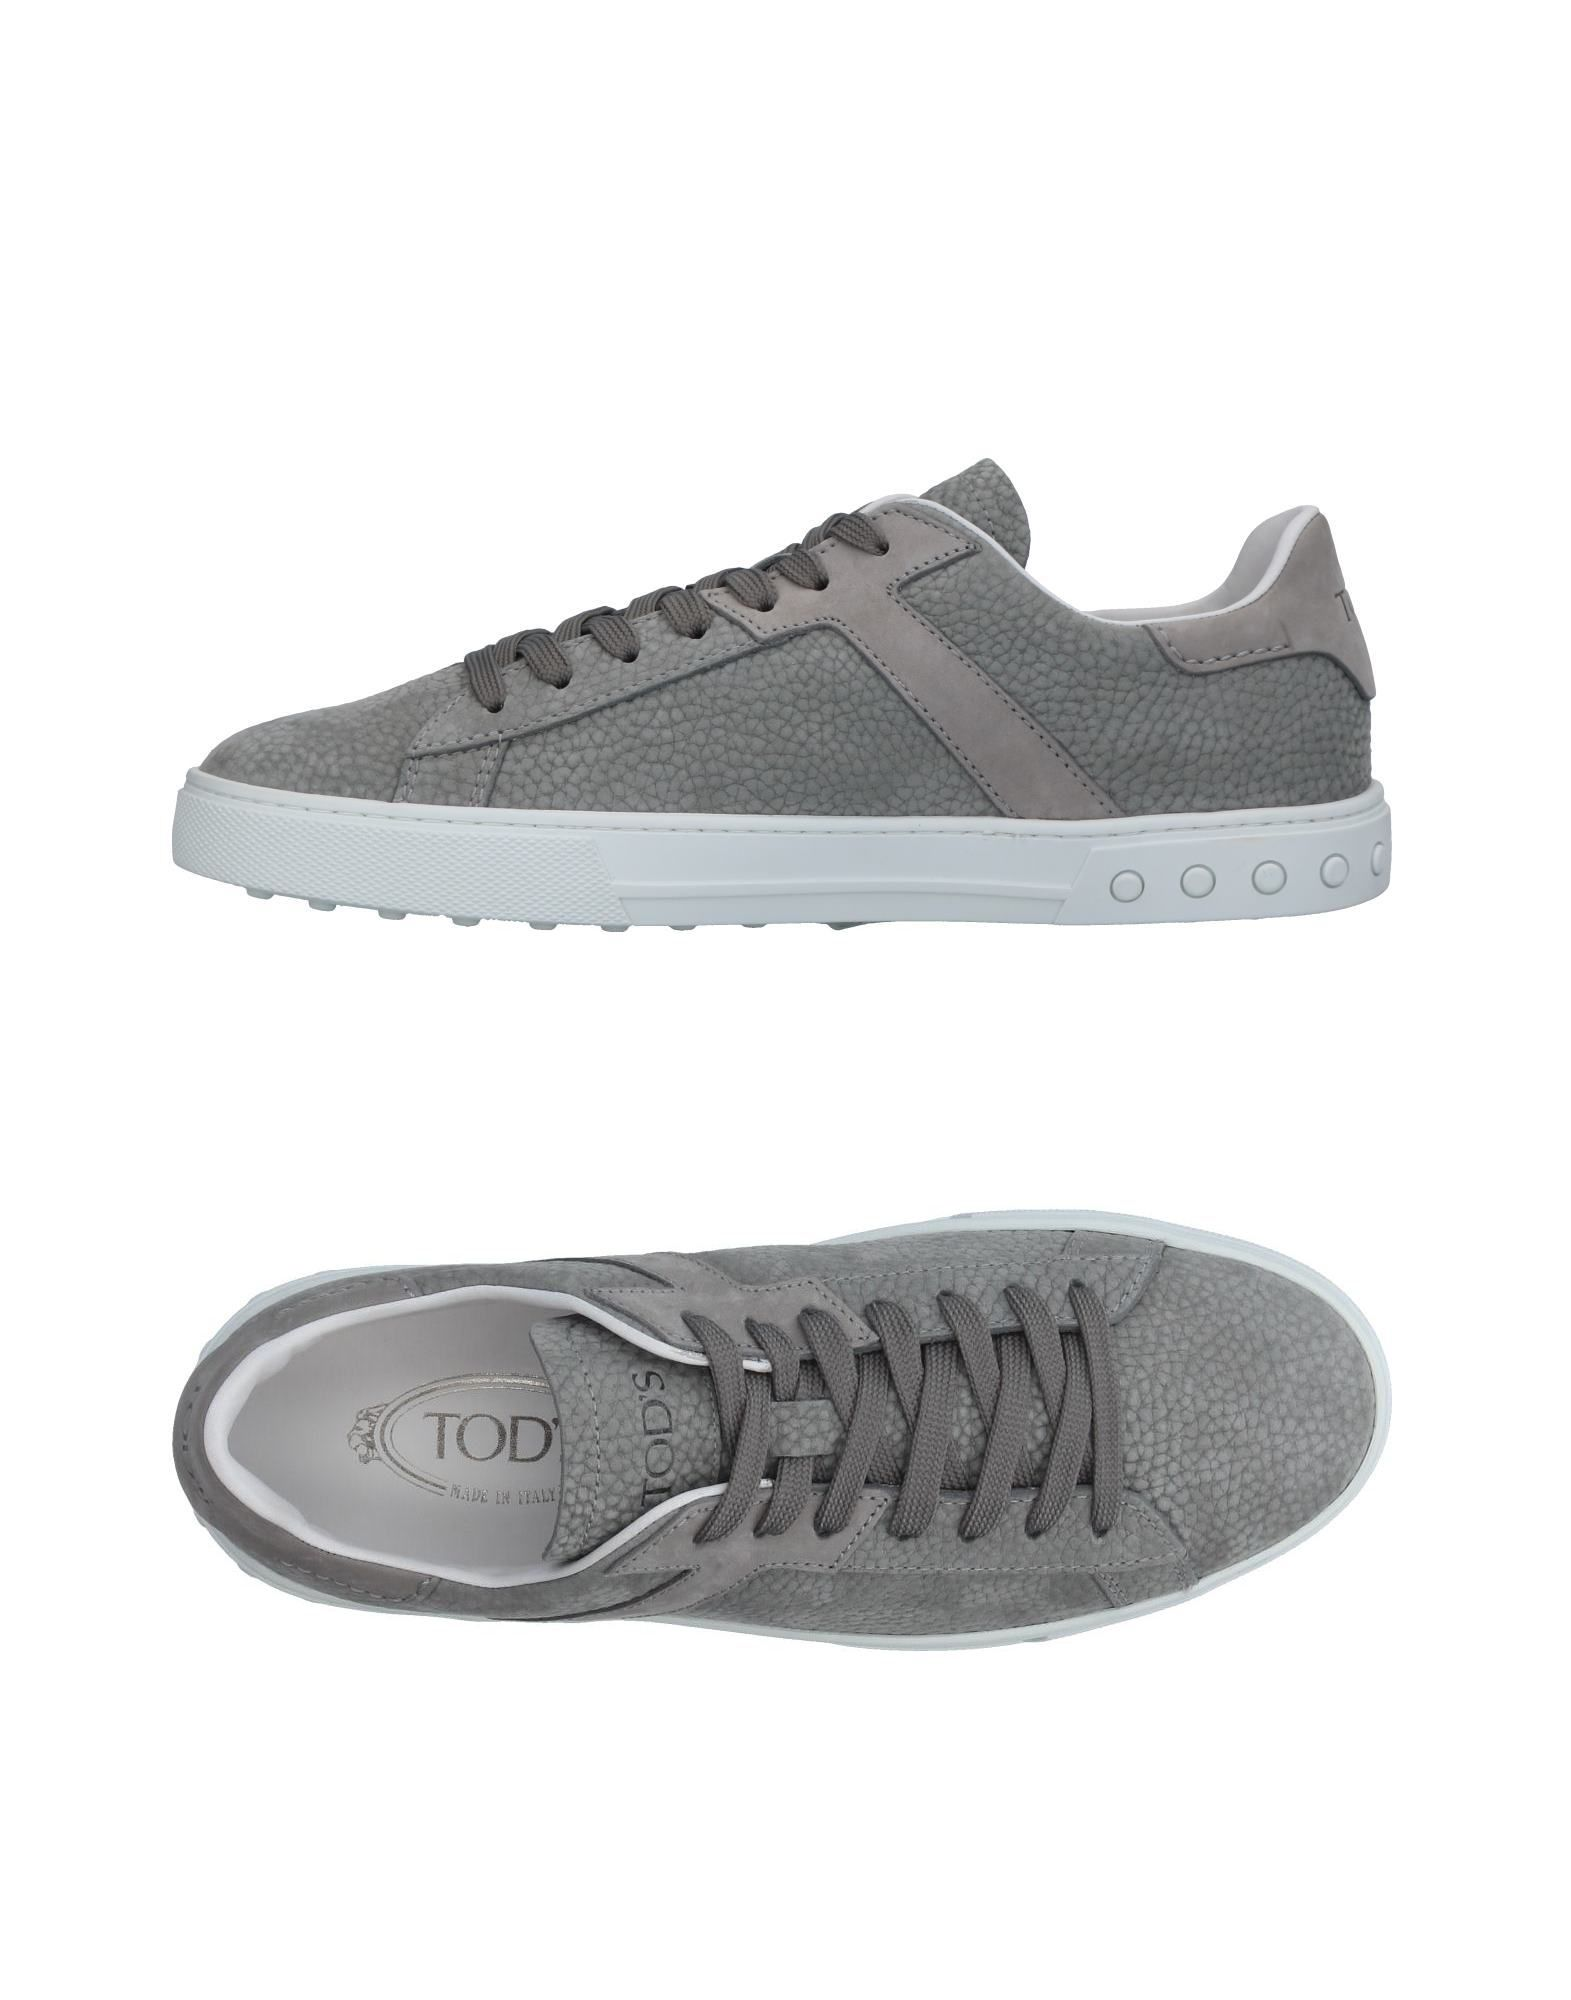 Moda Sneakers Tod's Uomo - 11354257RQ